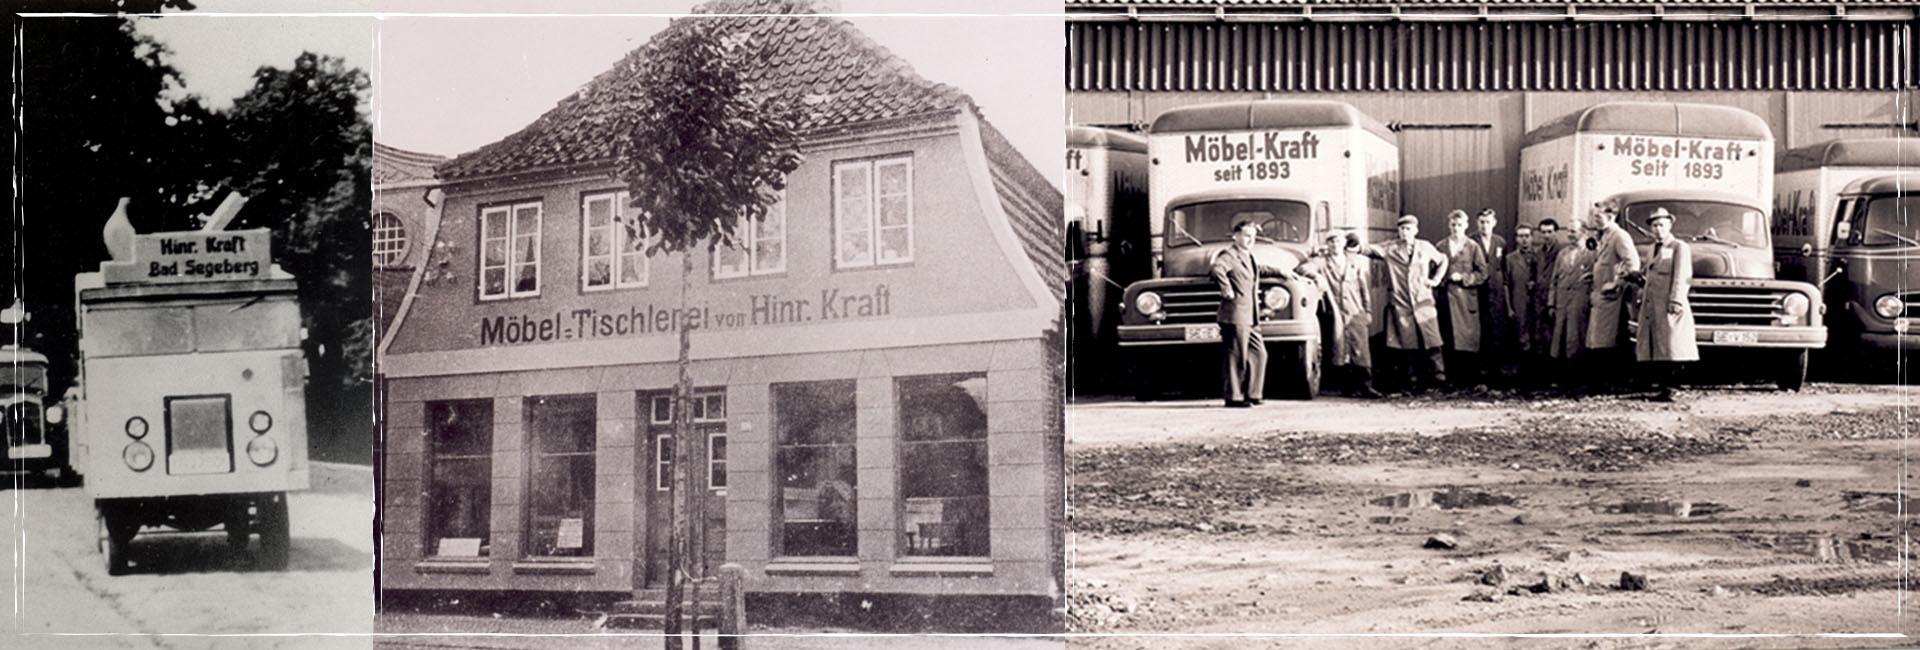 Möbel Kraft anno 1893